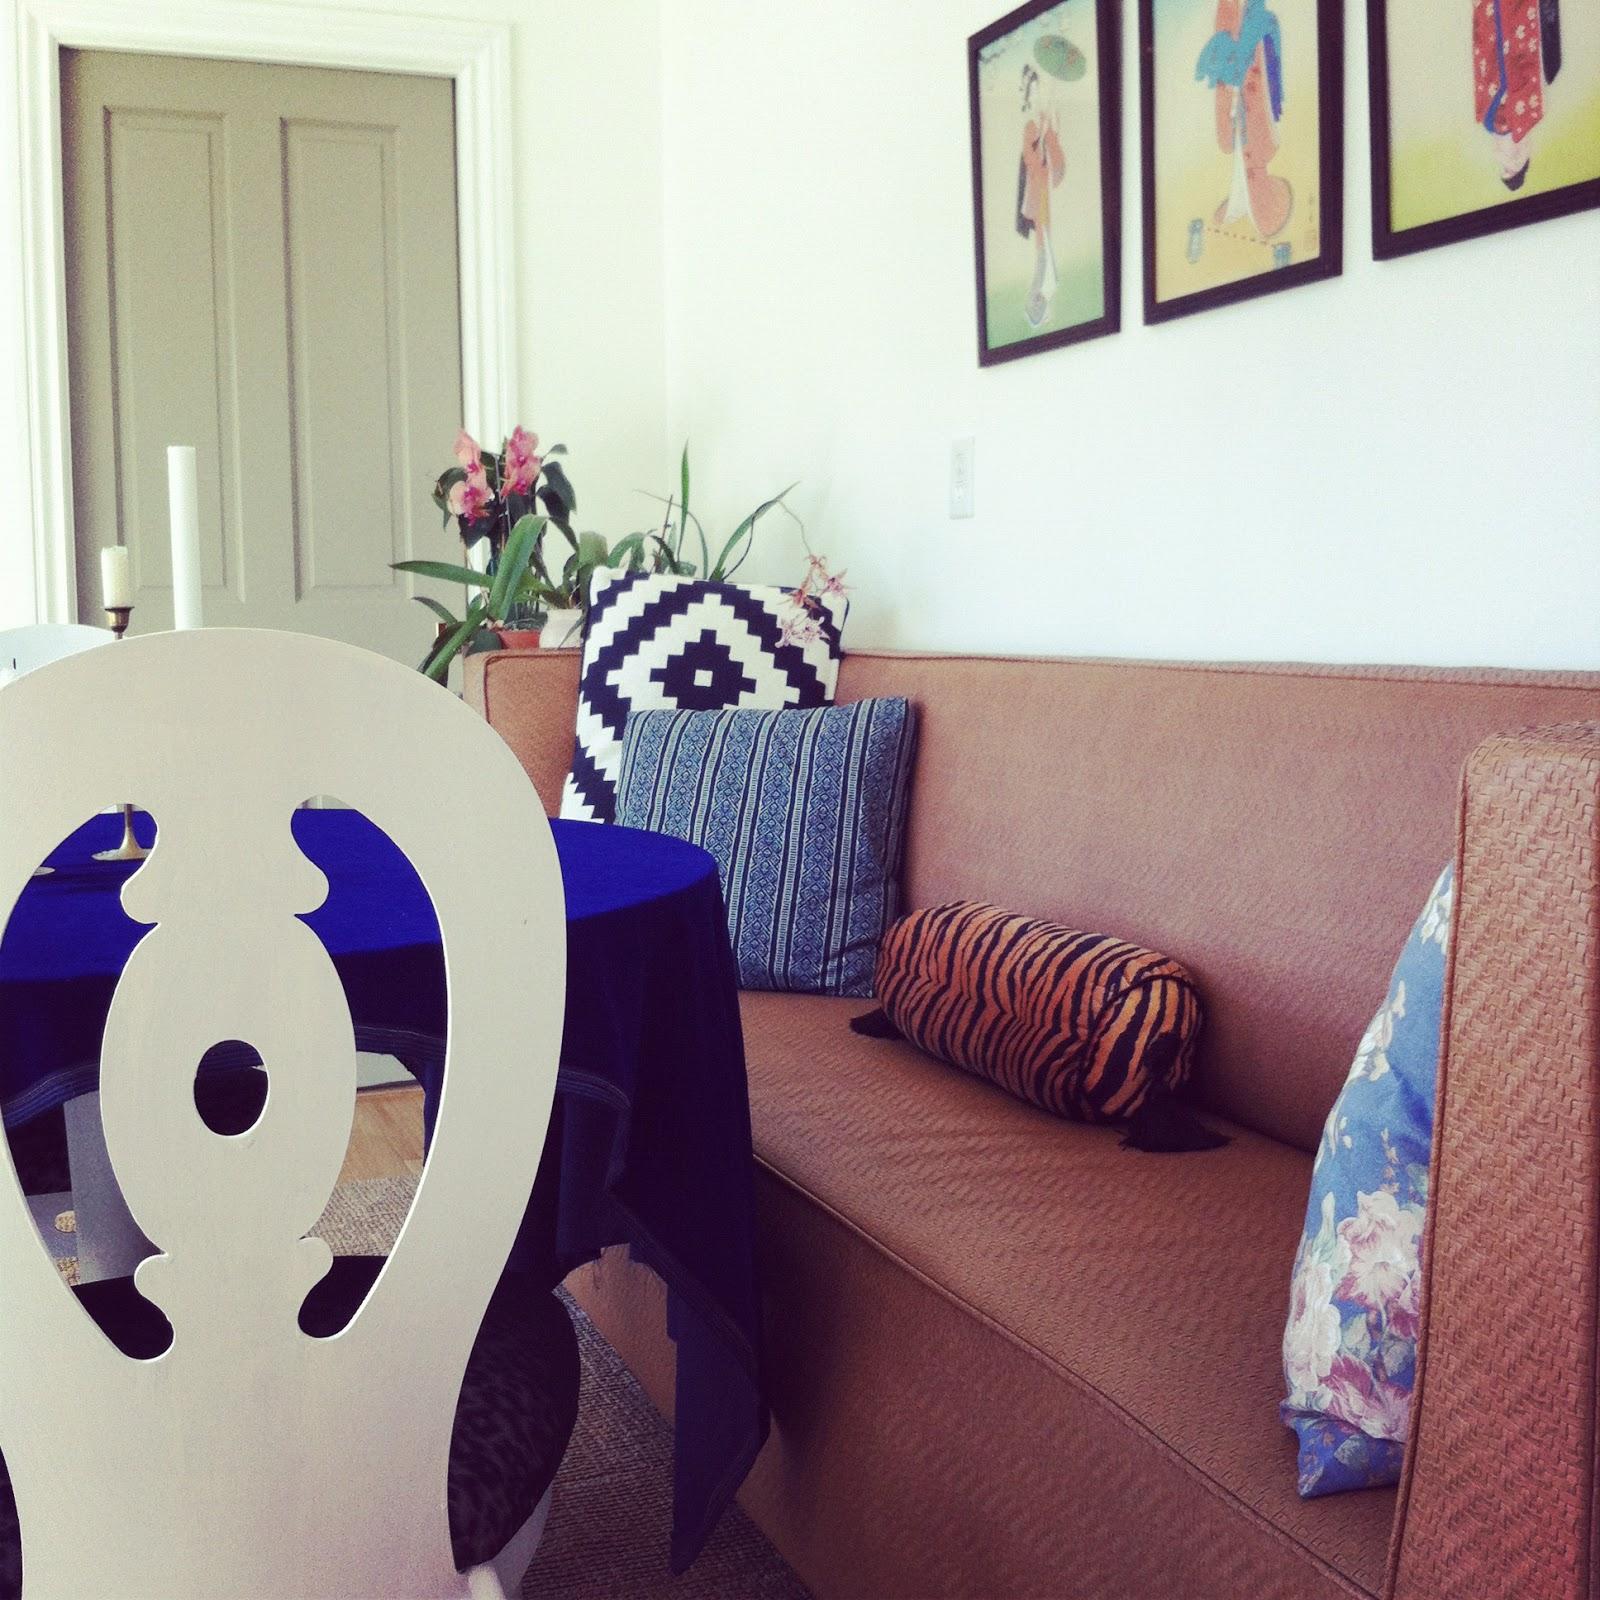 Katie gavigan interiors: november 2012